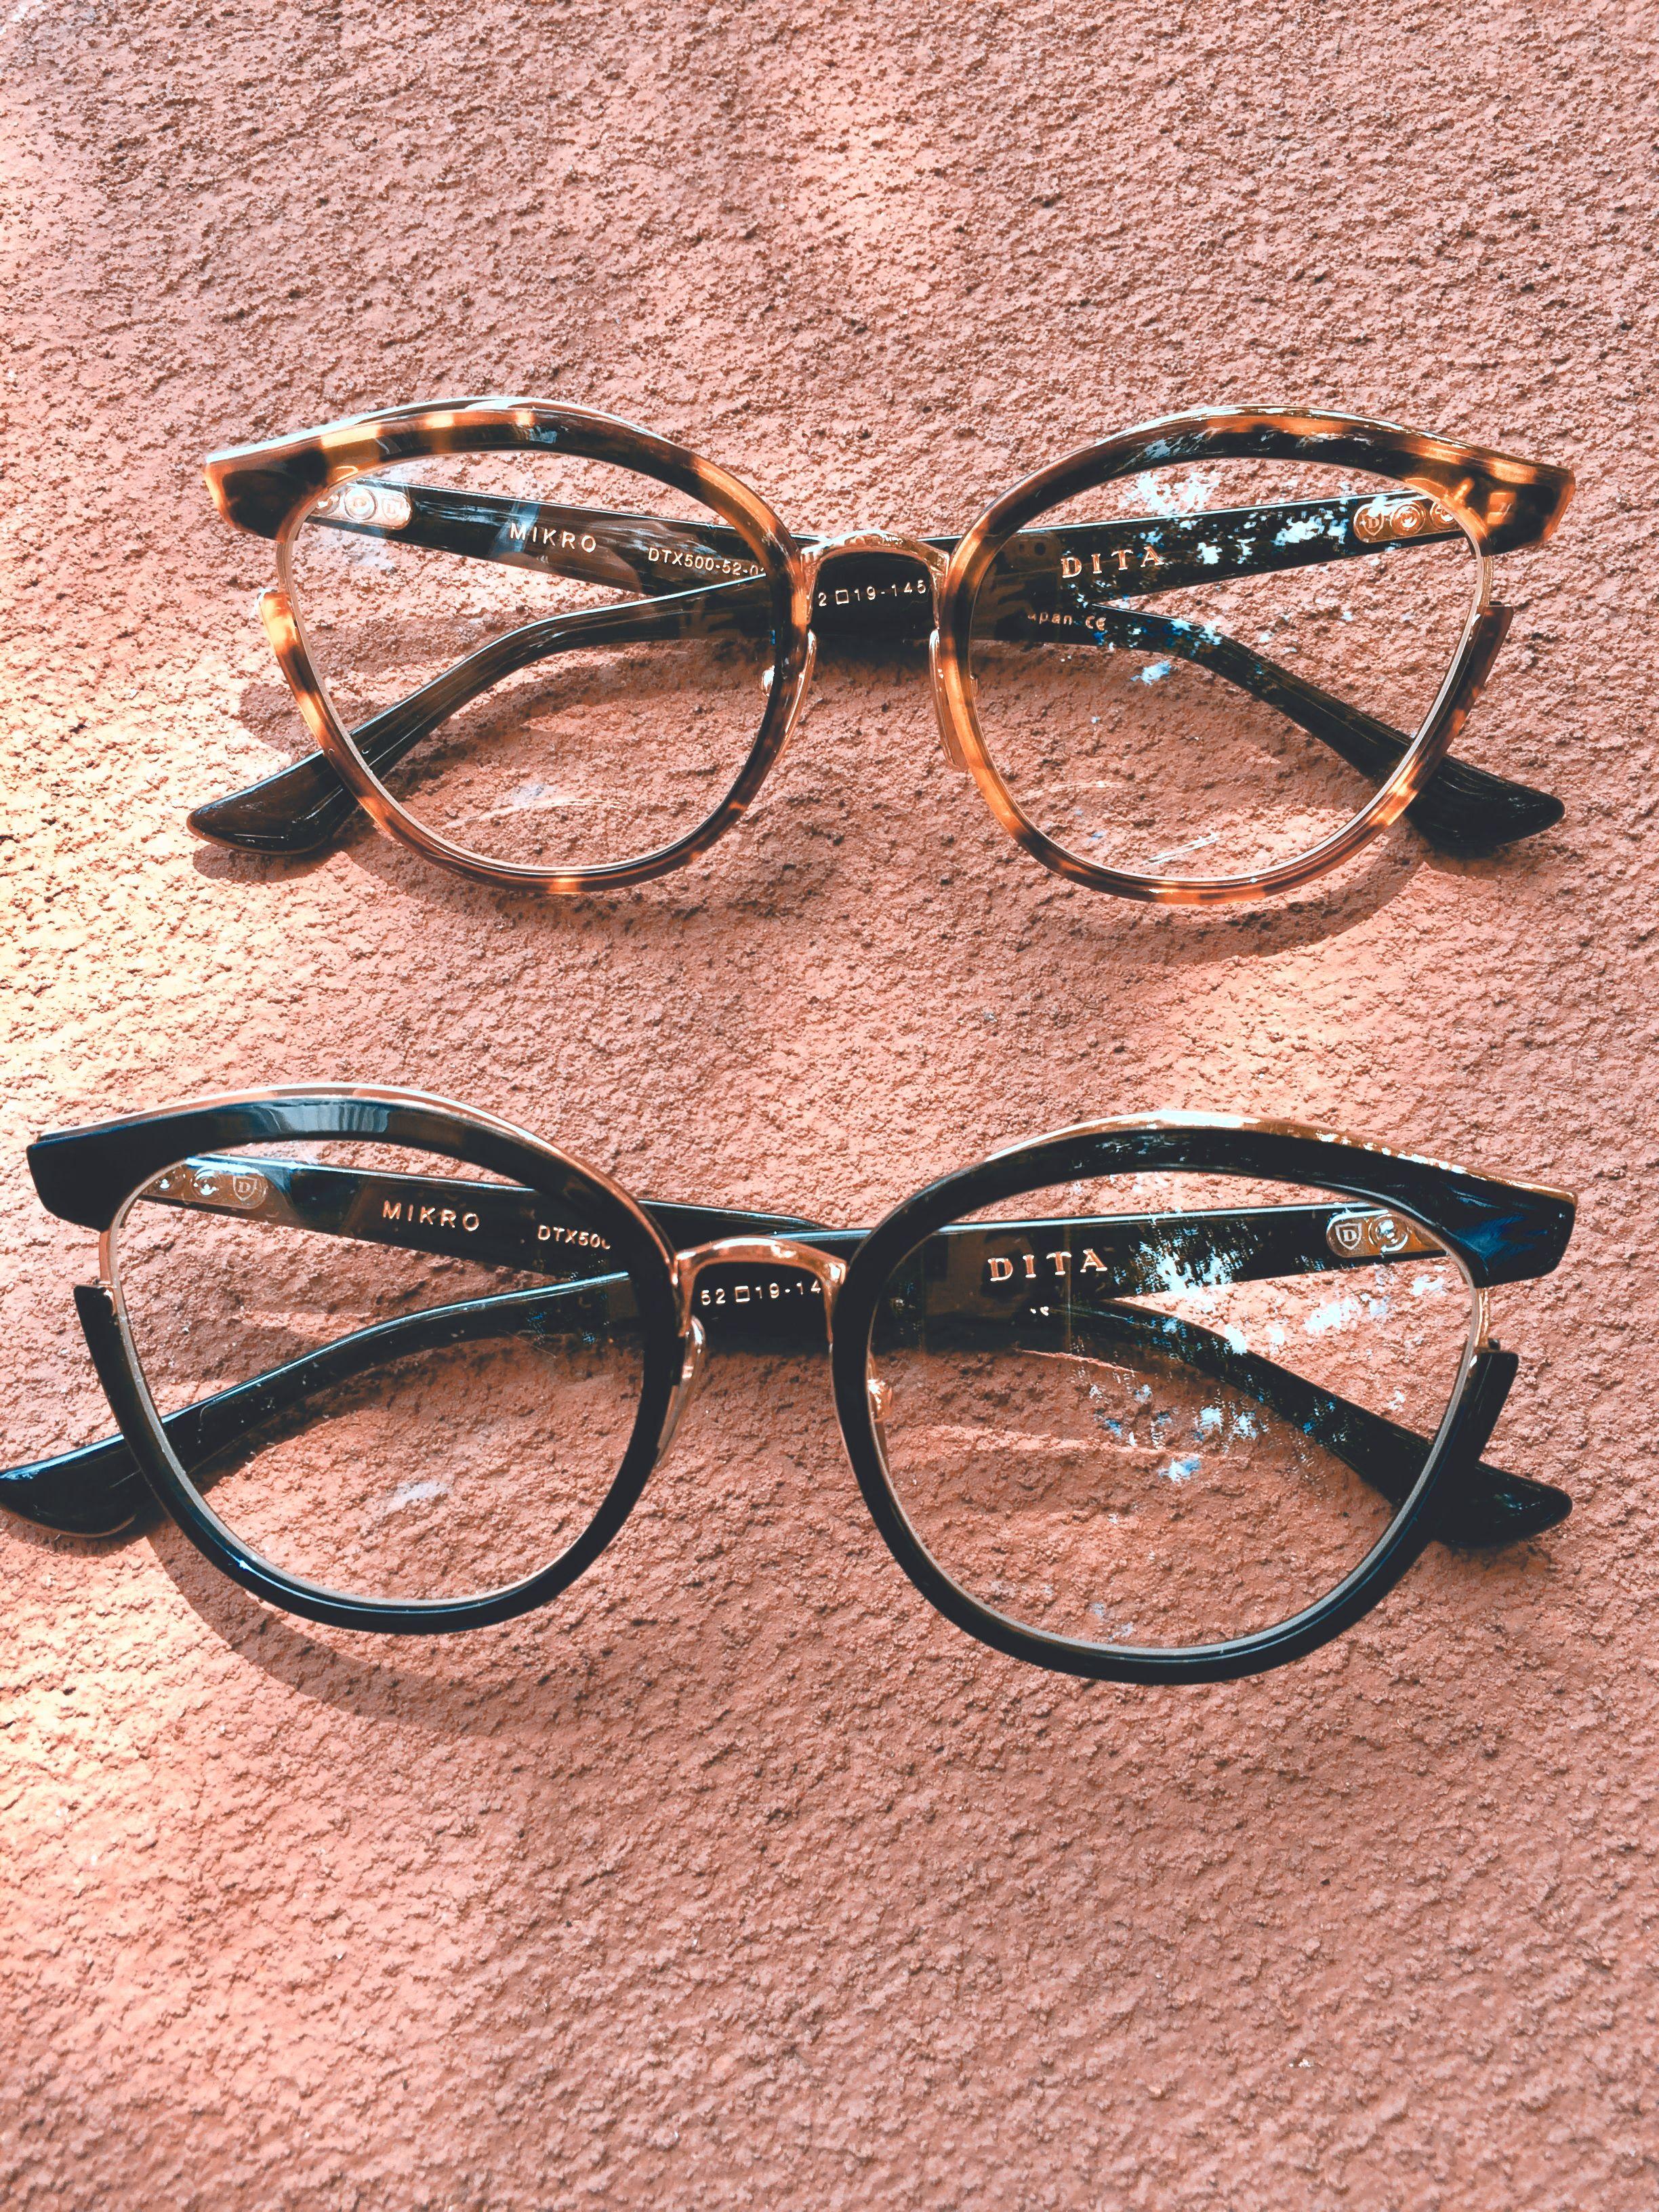 aae5746867df  DITAeyewear  subtlestatement  zeneyewear  specsoptical  optometrist   optician  specs  eyeglasses  sunglasses  lunettes  lunettedesoliel  gafas  ...